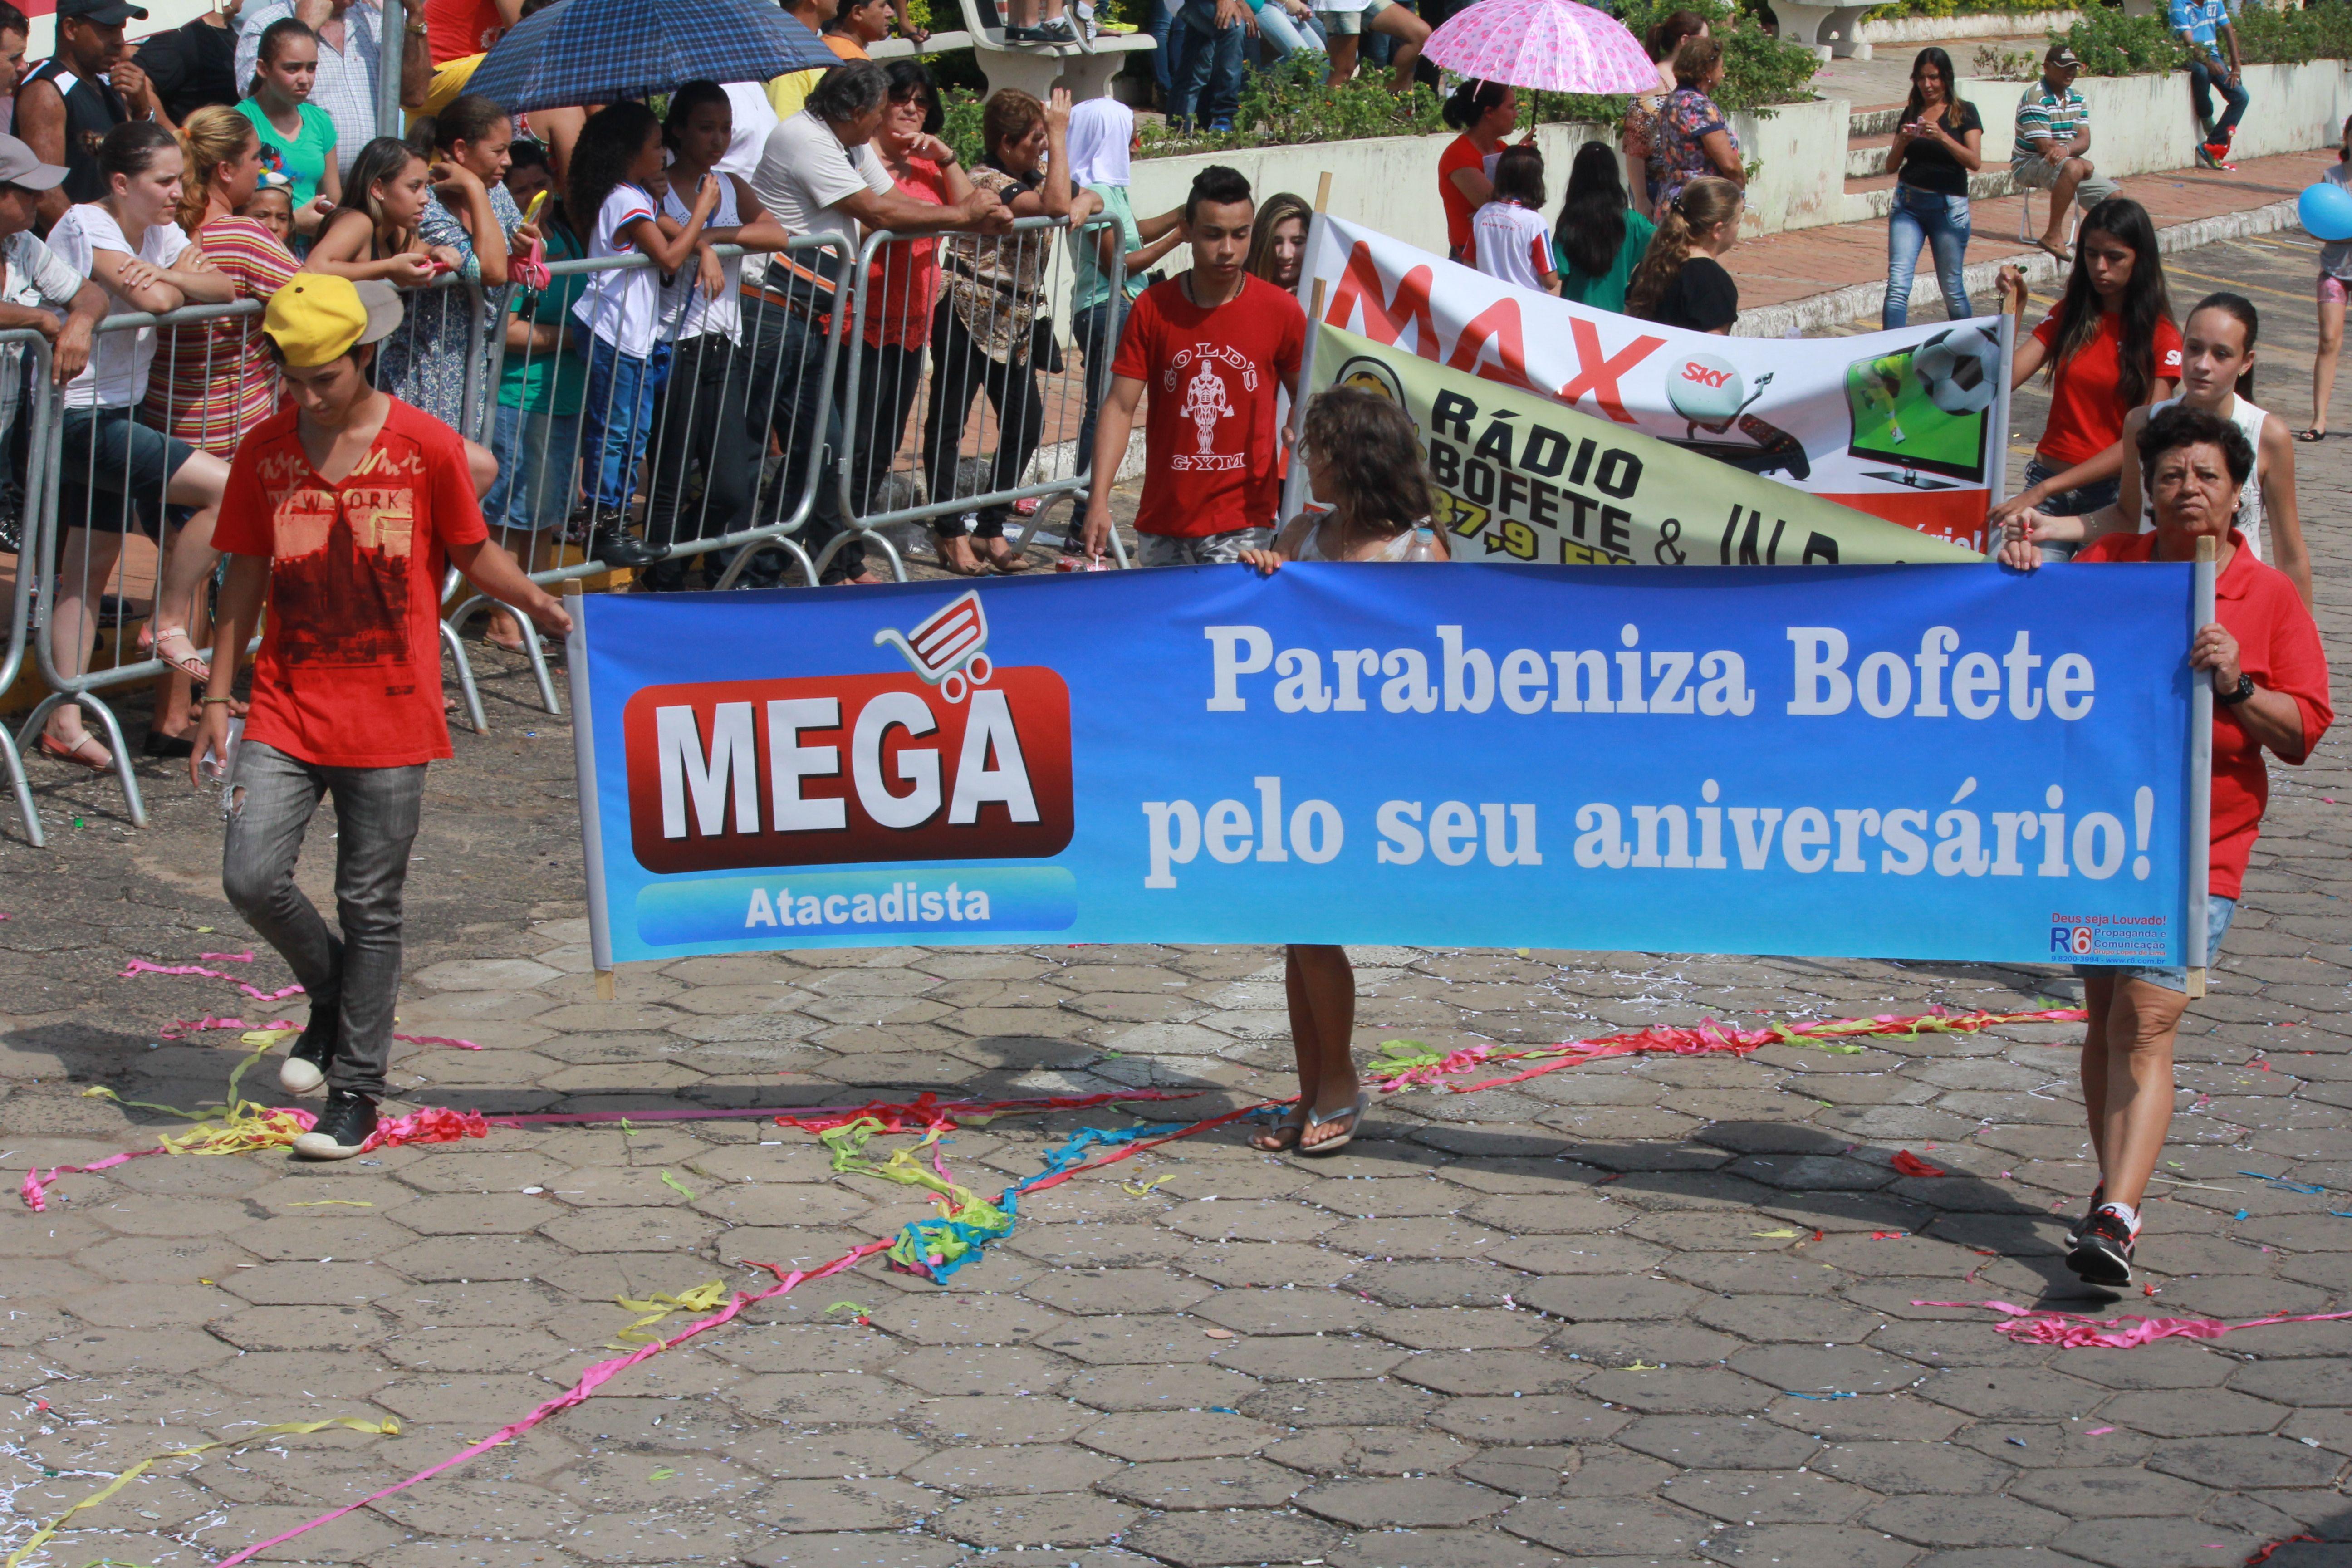 Desfile Cívico do Aniversário de Bofete - 135 anos - Comércios - Mega Atacadista